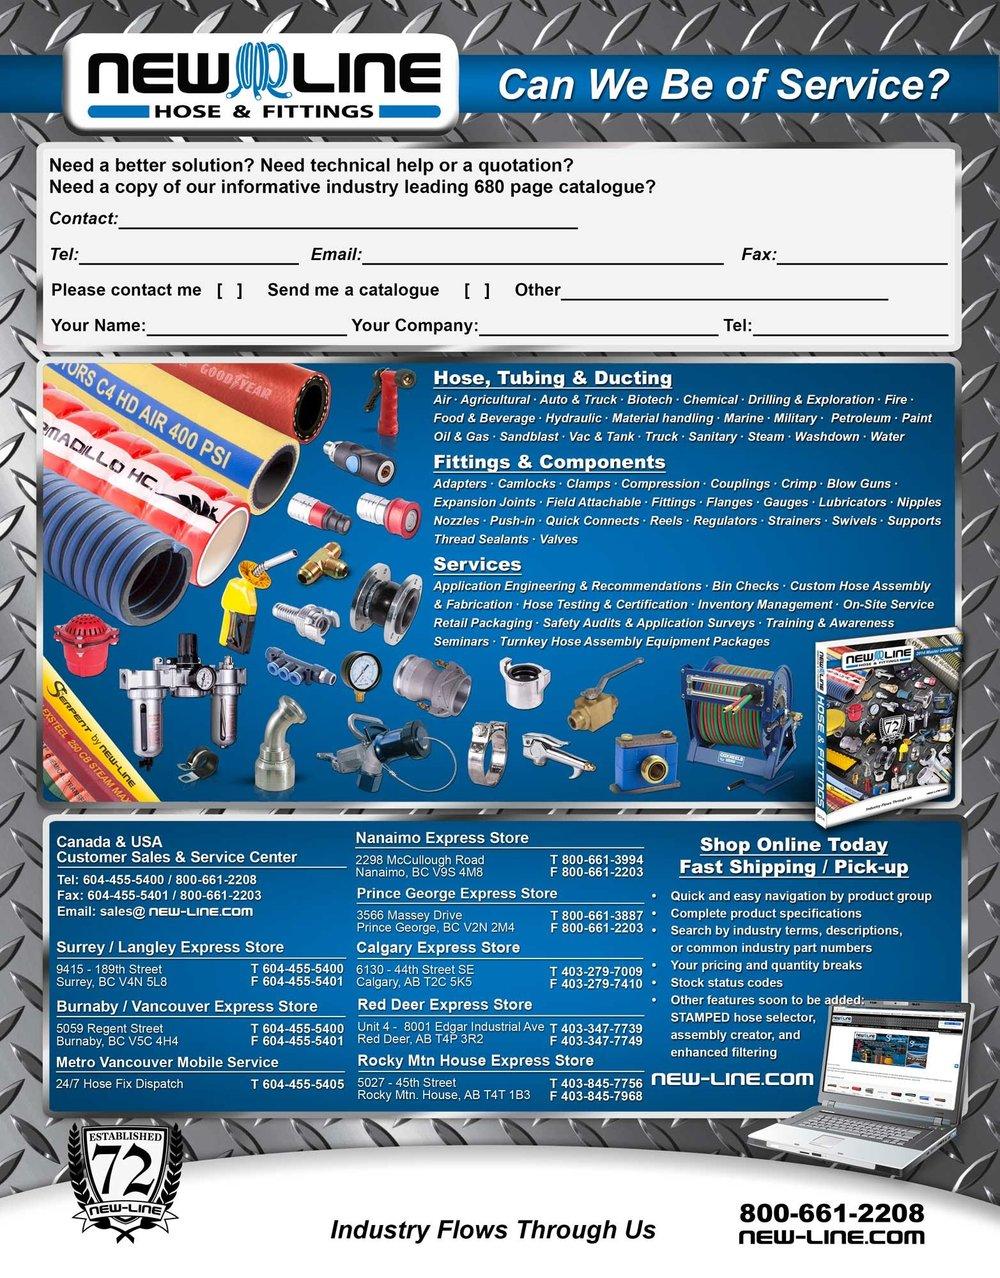 CKNL-Trade-Show-Sevice-Flyer.jpg